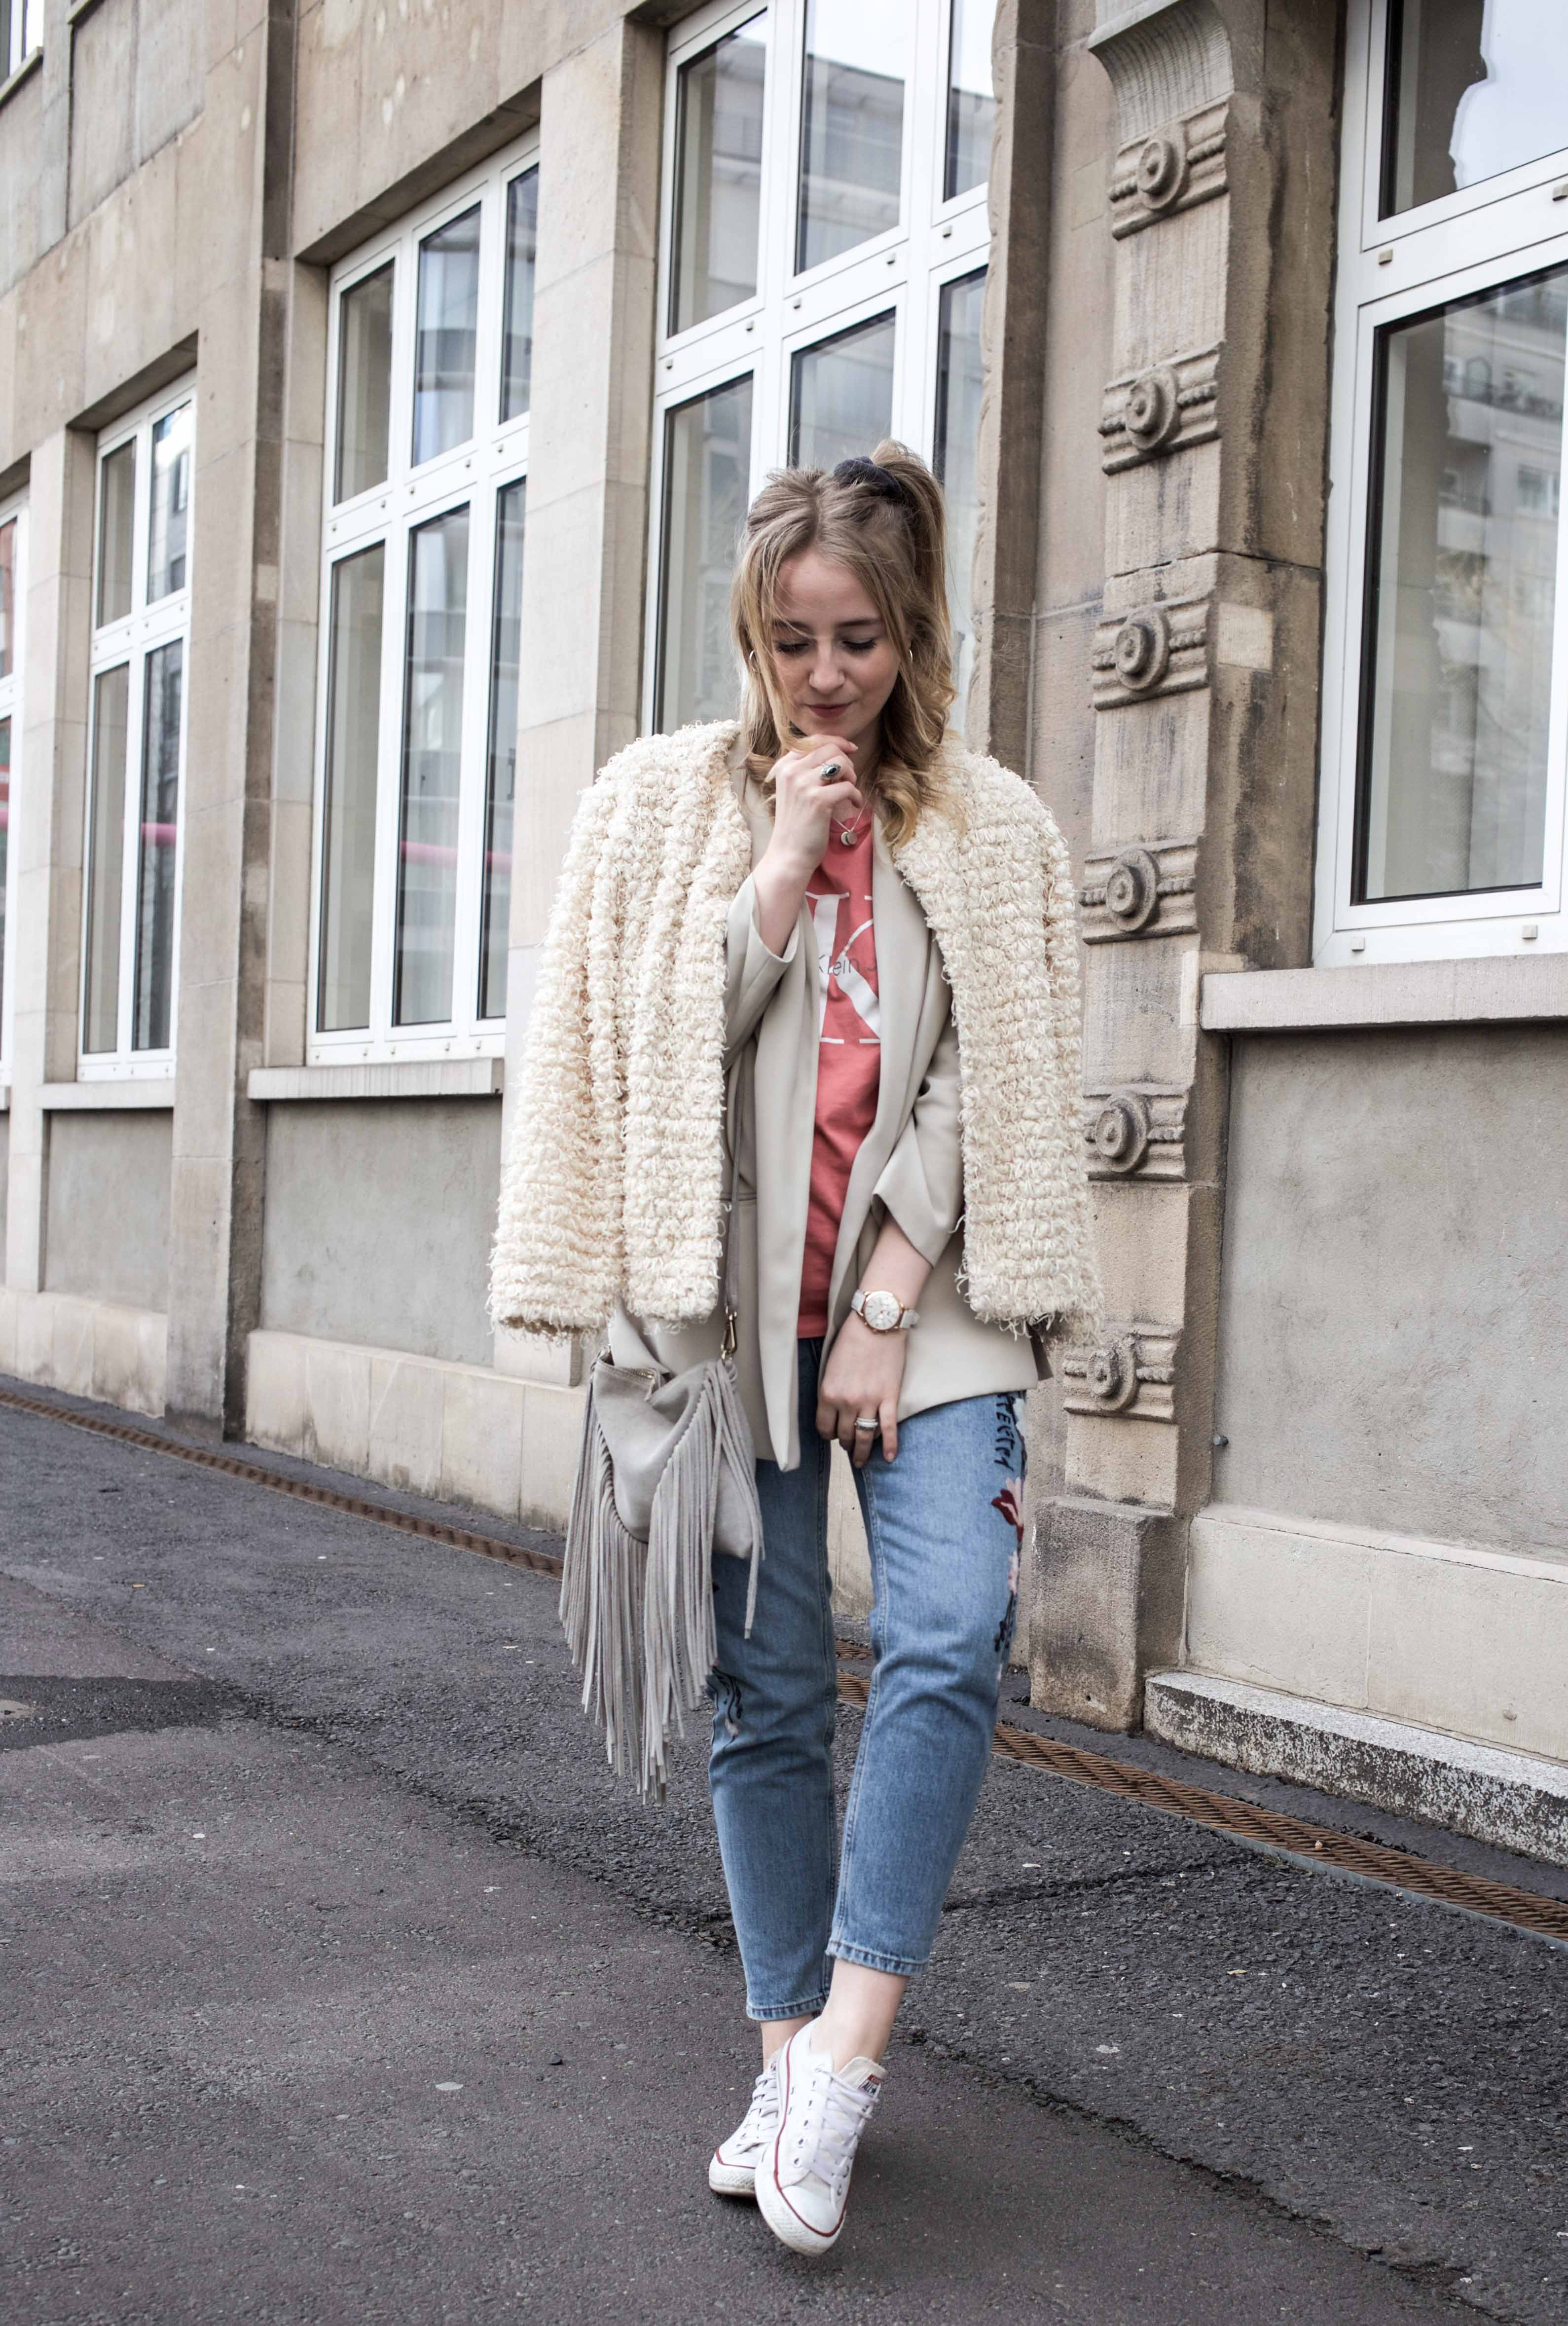 Frühlingslook-Berlin-Mom-Jeans-Blumenprint-Fashionblog-Blogger-Calvin-Klein-Tshirt-streetstyle_4612